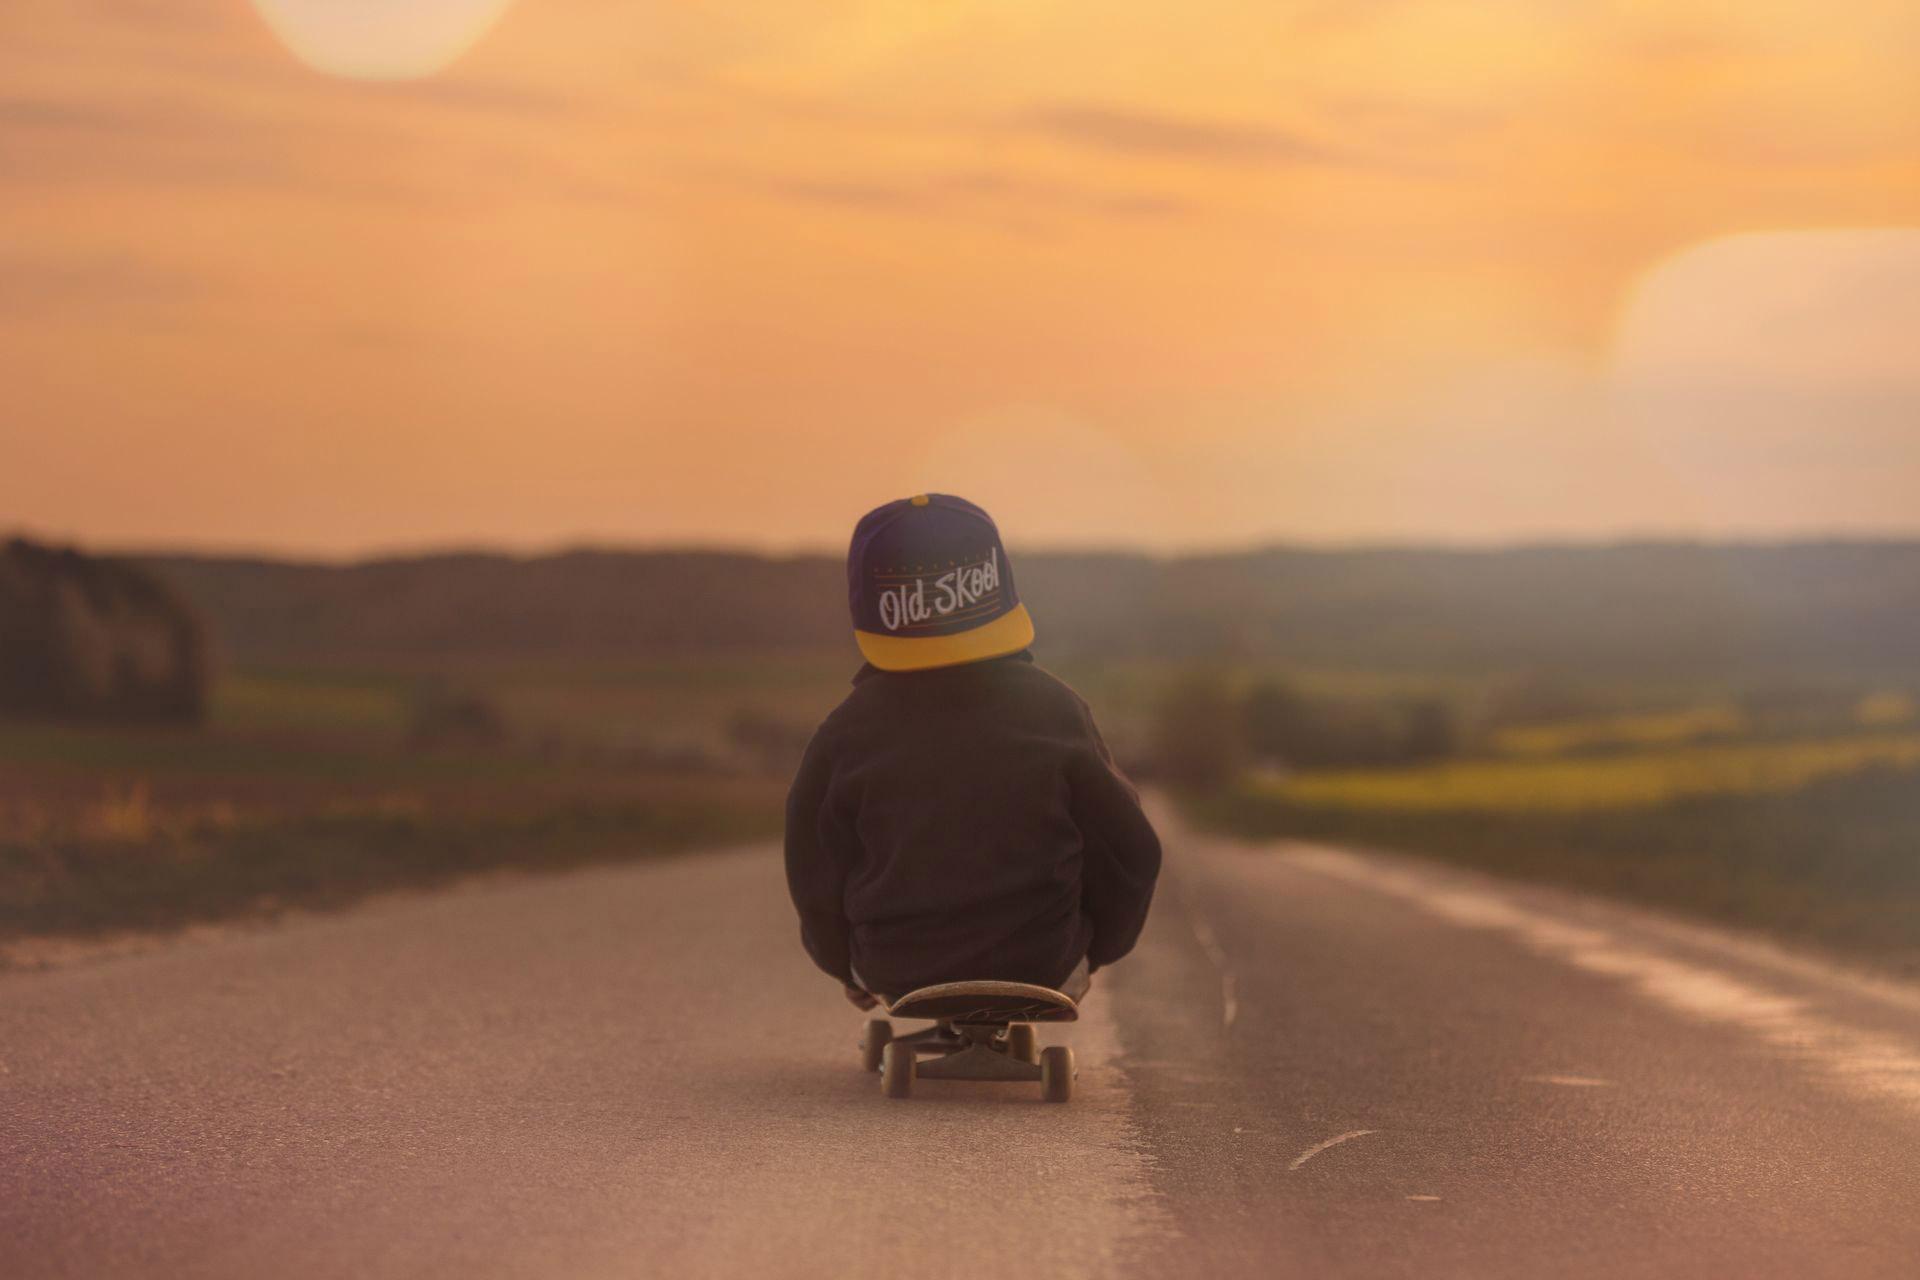 skateboard_voyage_mfr